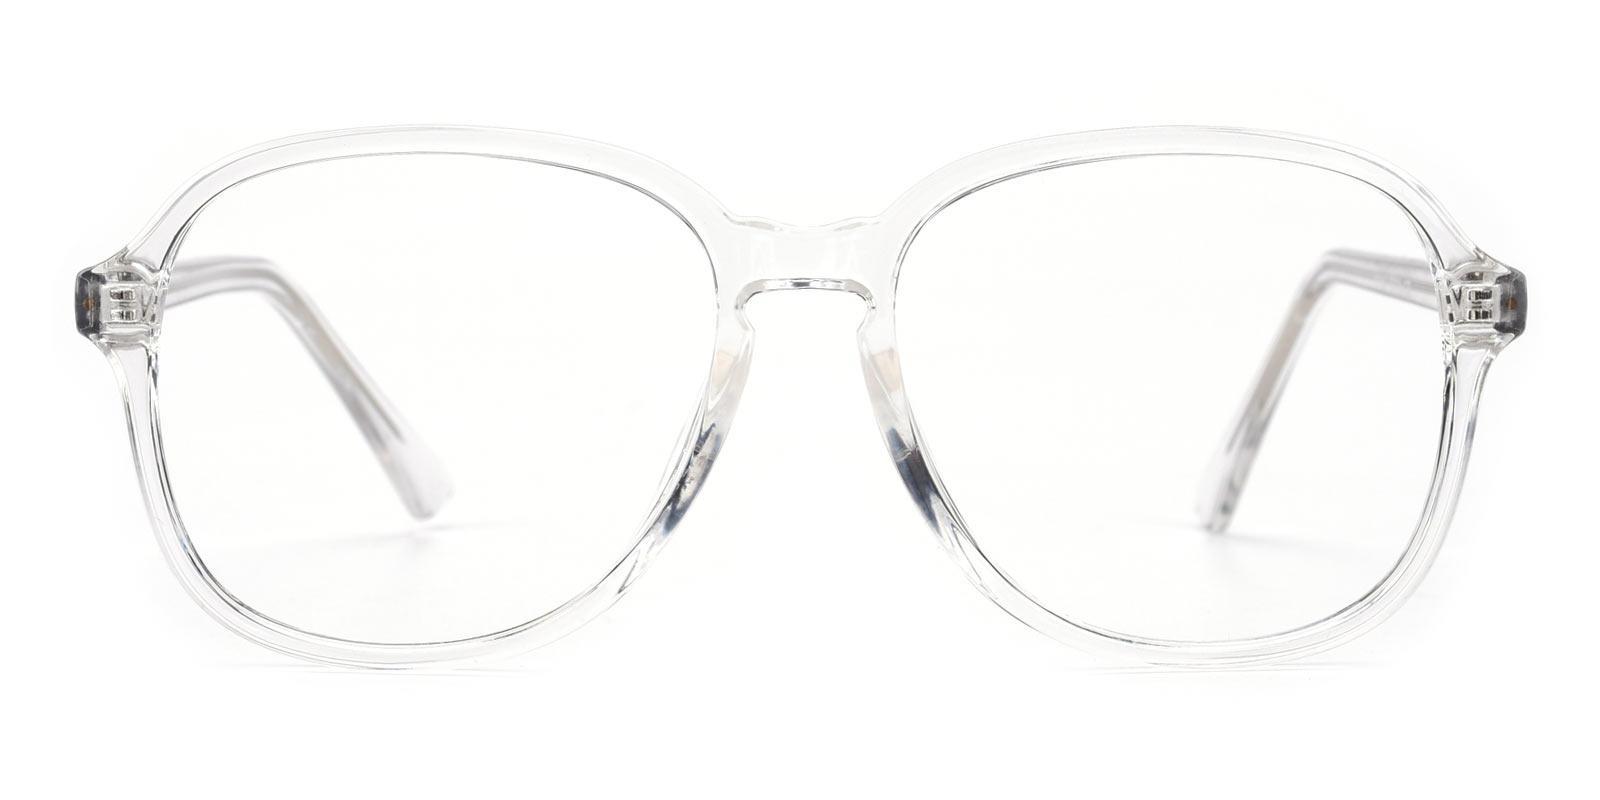 70s-Translucent-Square-TR-Eyeglasses-additional2